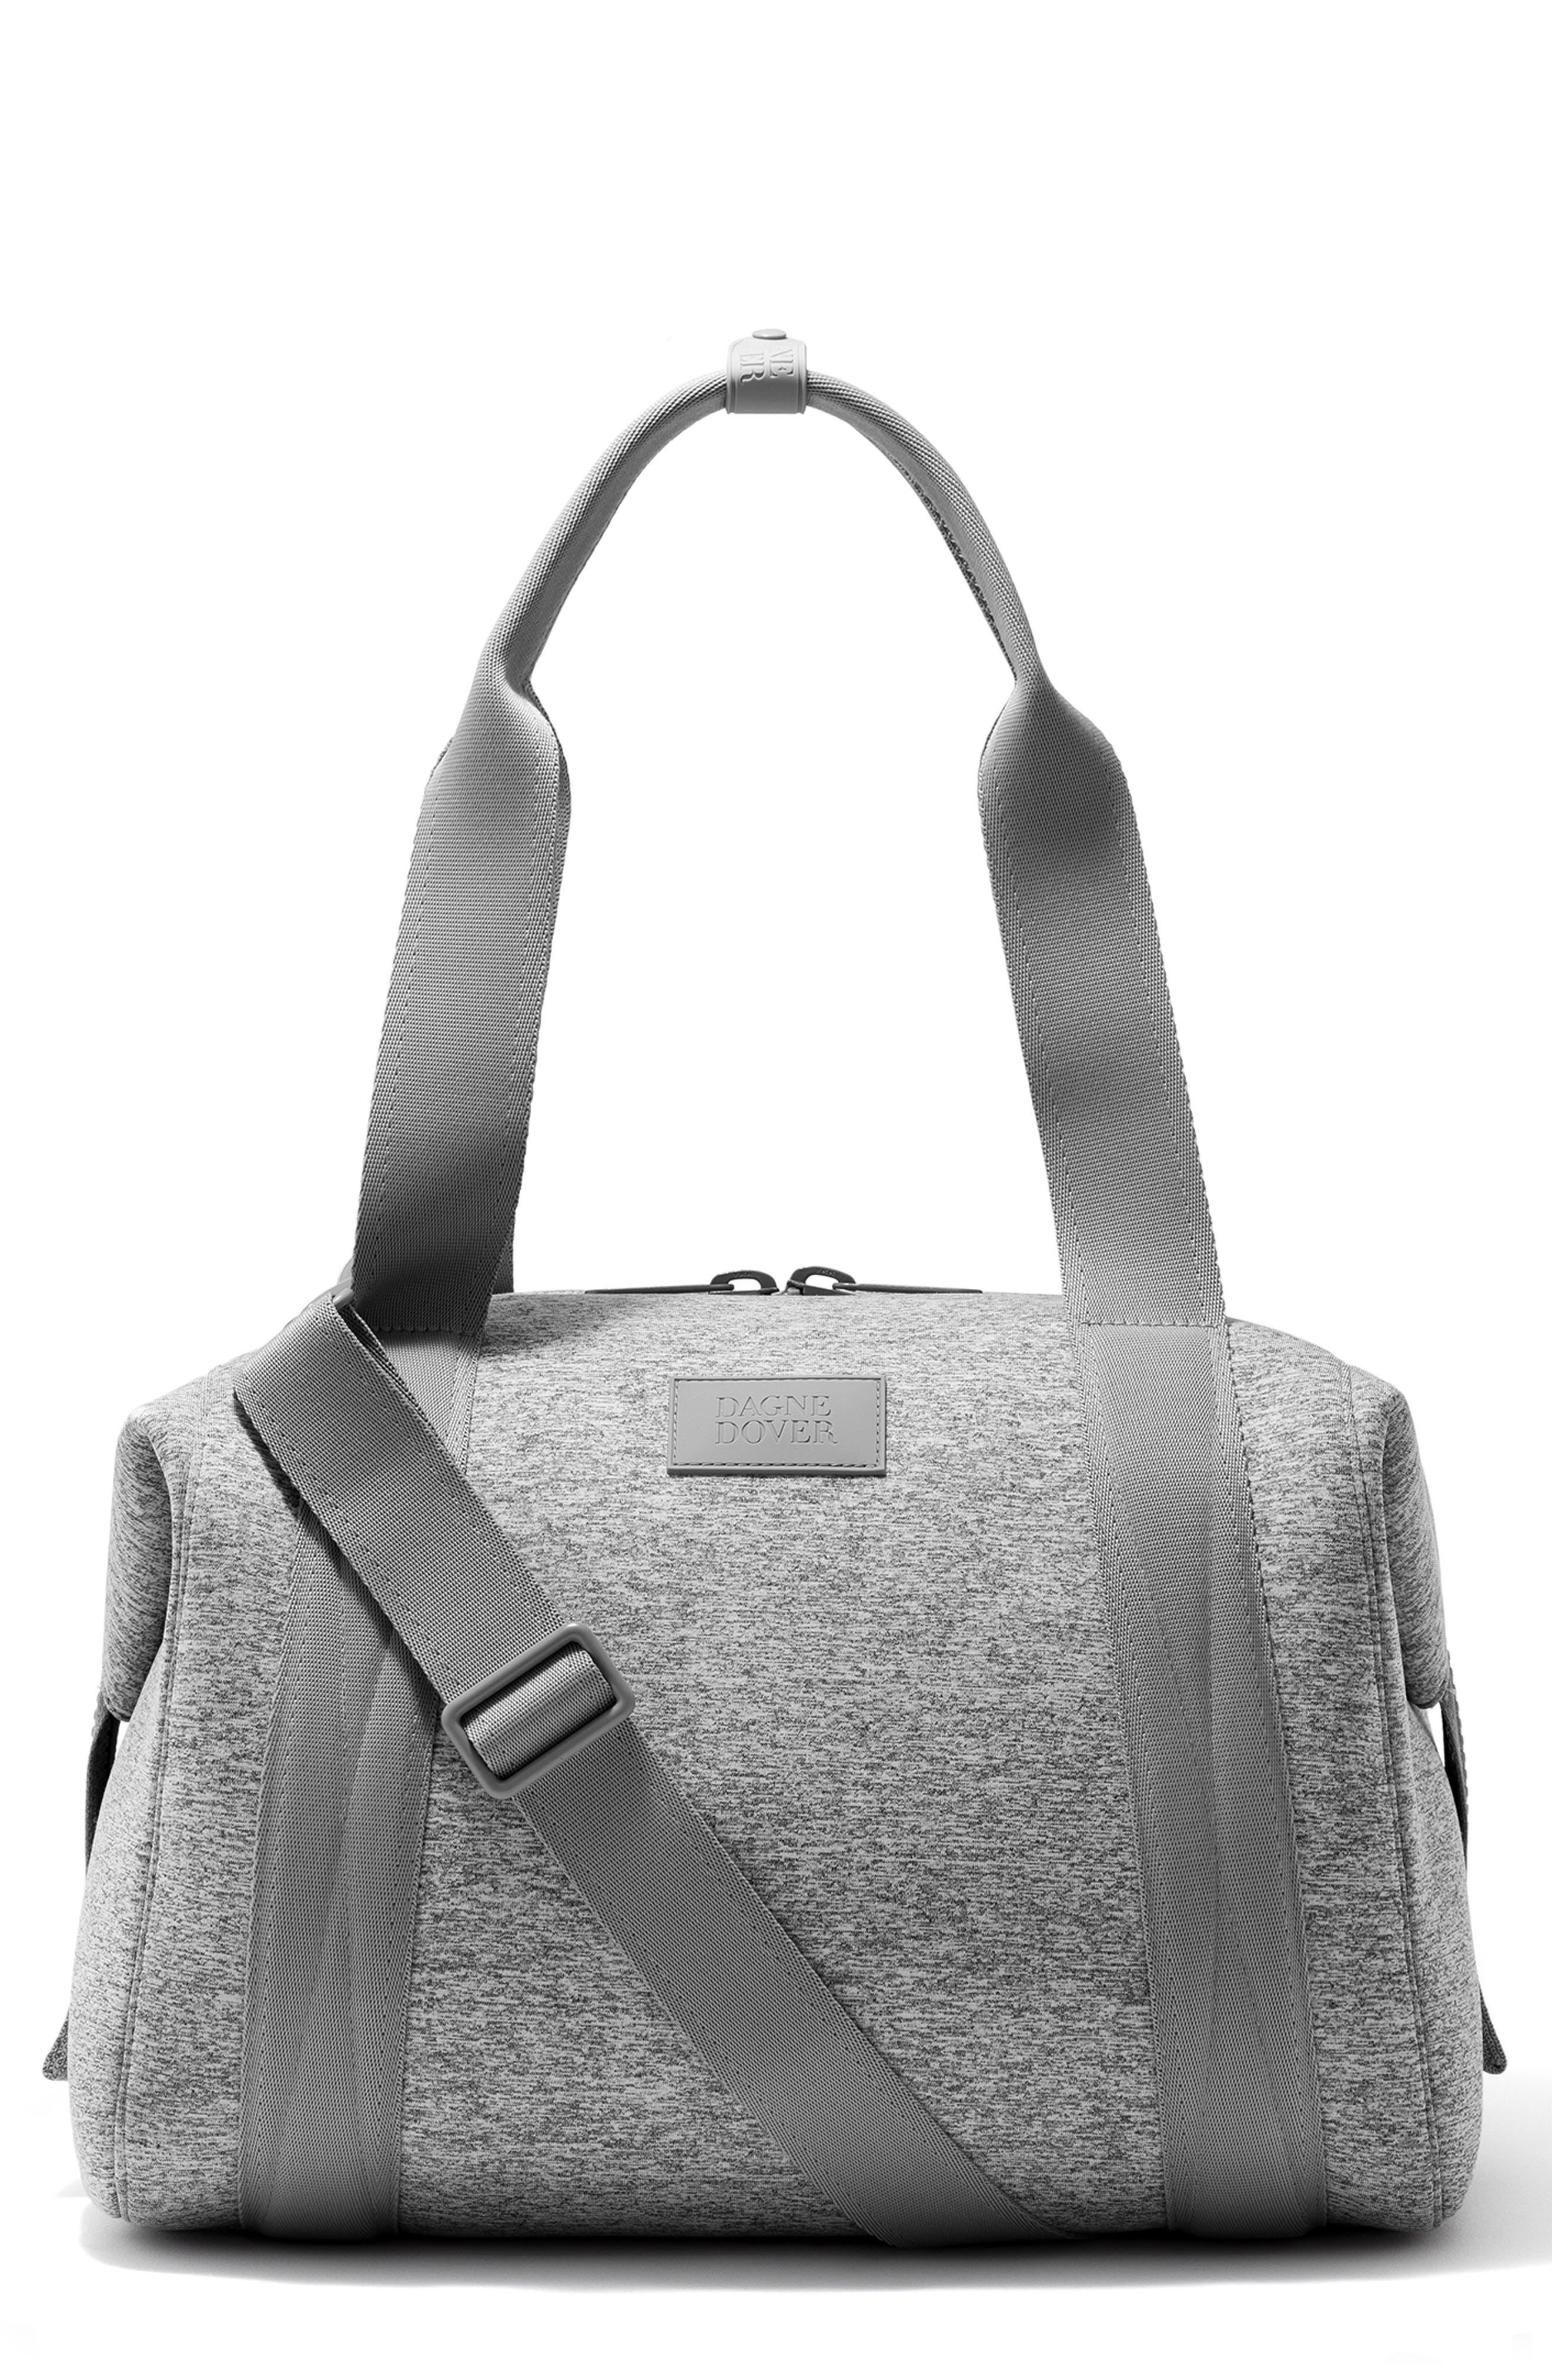 DAGNE DOVER, 365 Medium Landon Neoprene Carryall Duffle Bag, Main thumbnail 1, color, HEATHER GREY